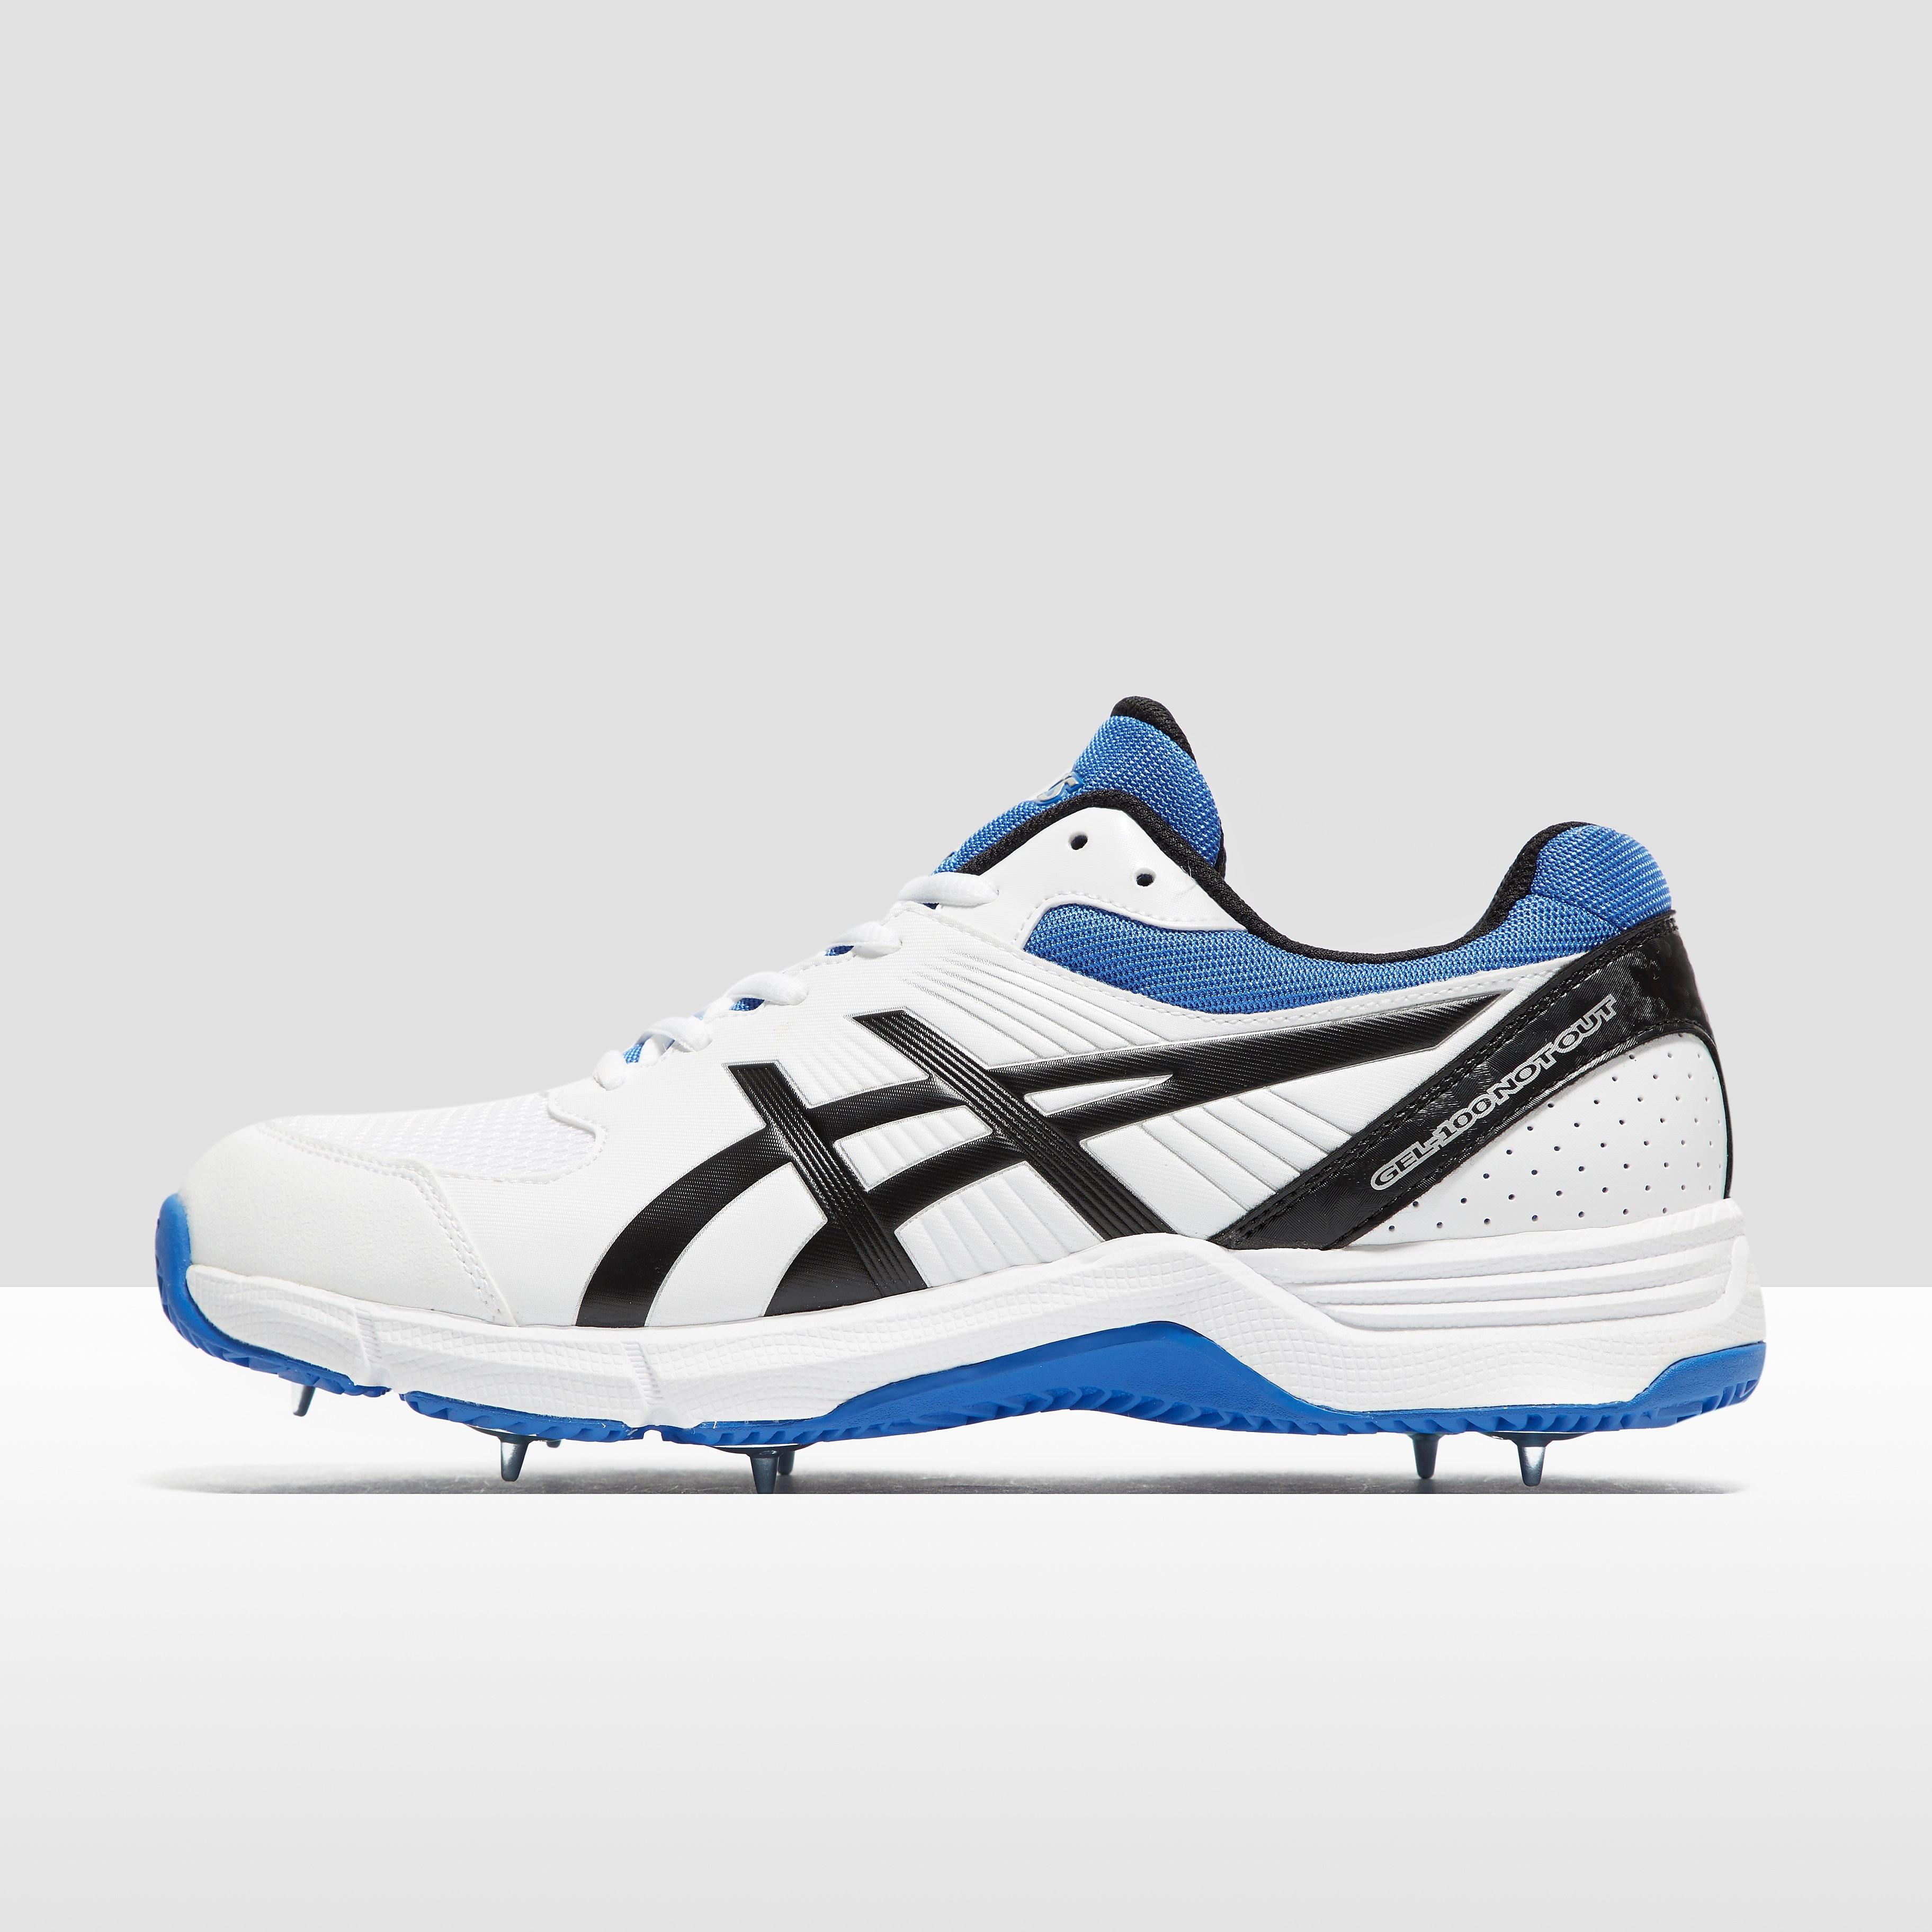 Asics Gel-100 Not Out Men's Cricket Shoe